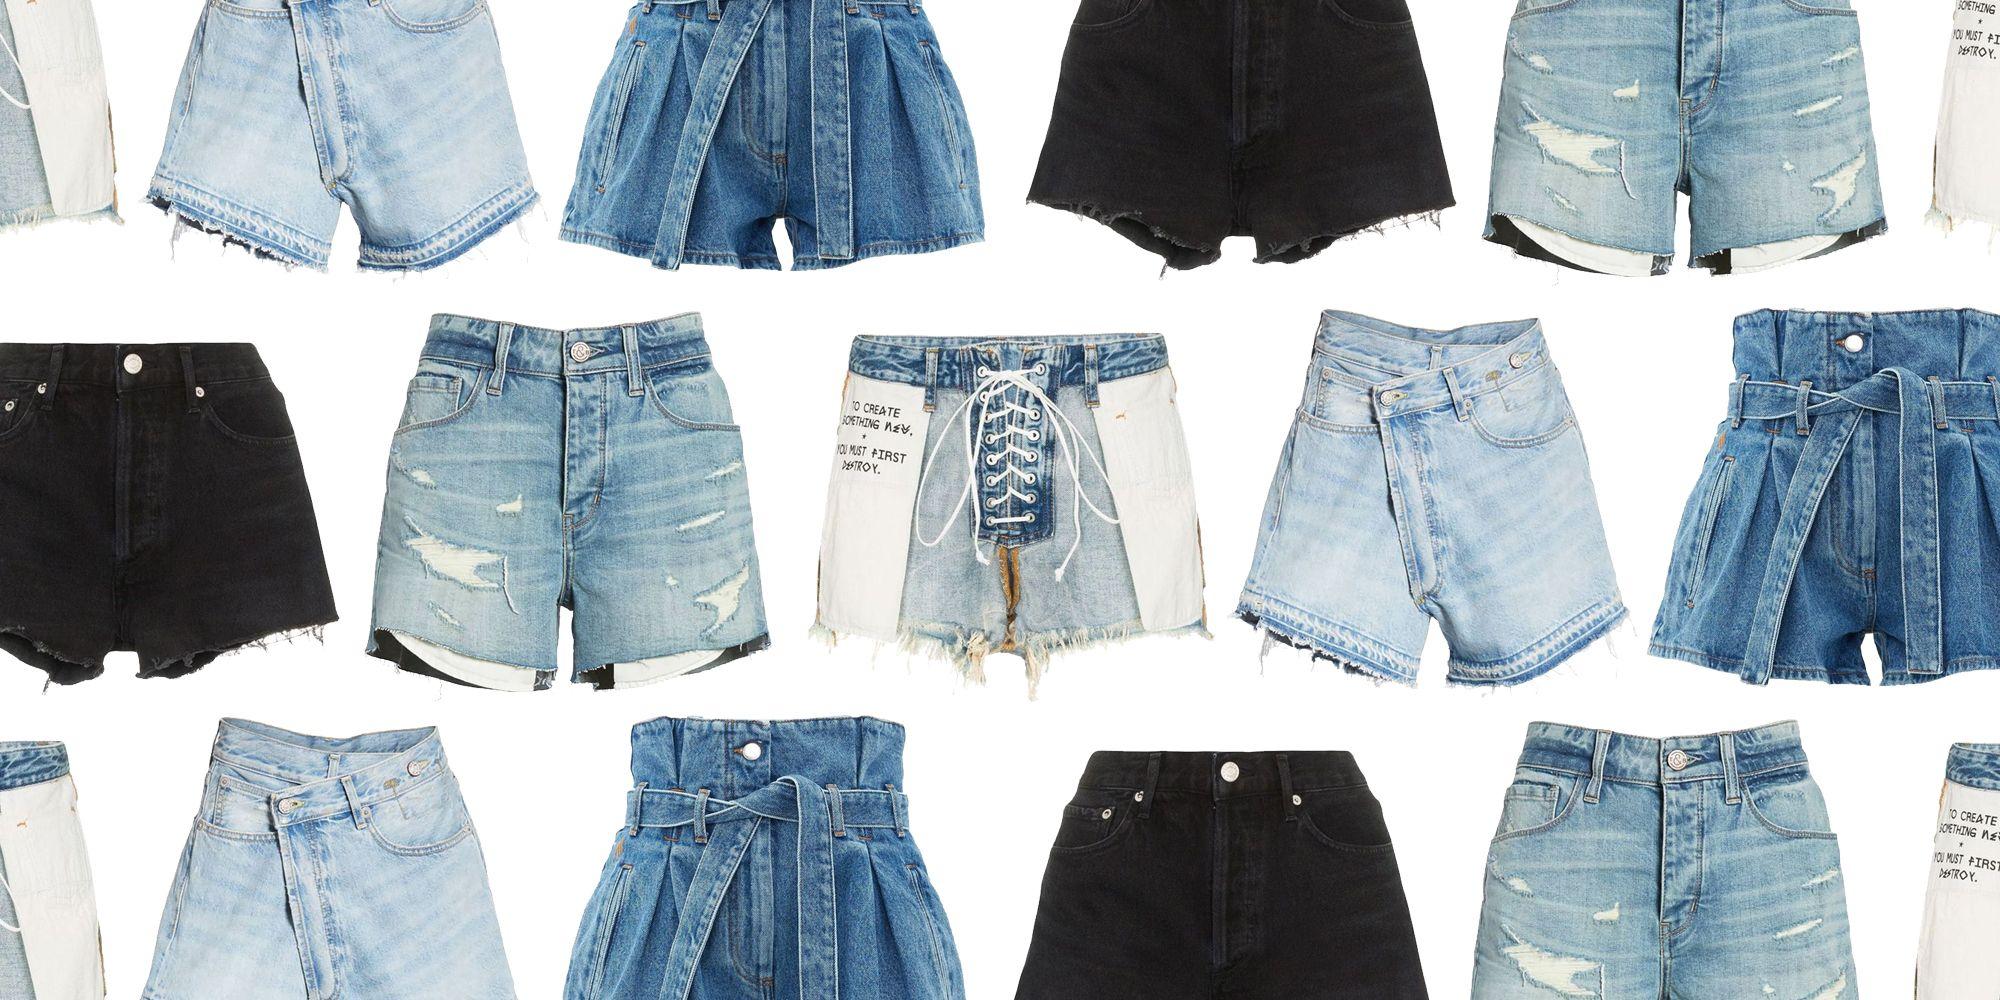 peeking up womens shorts